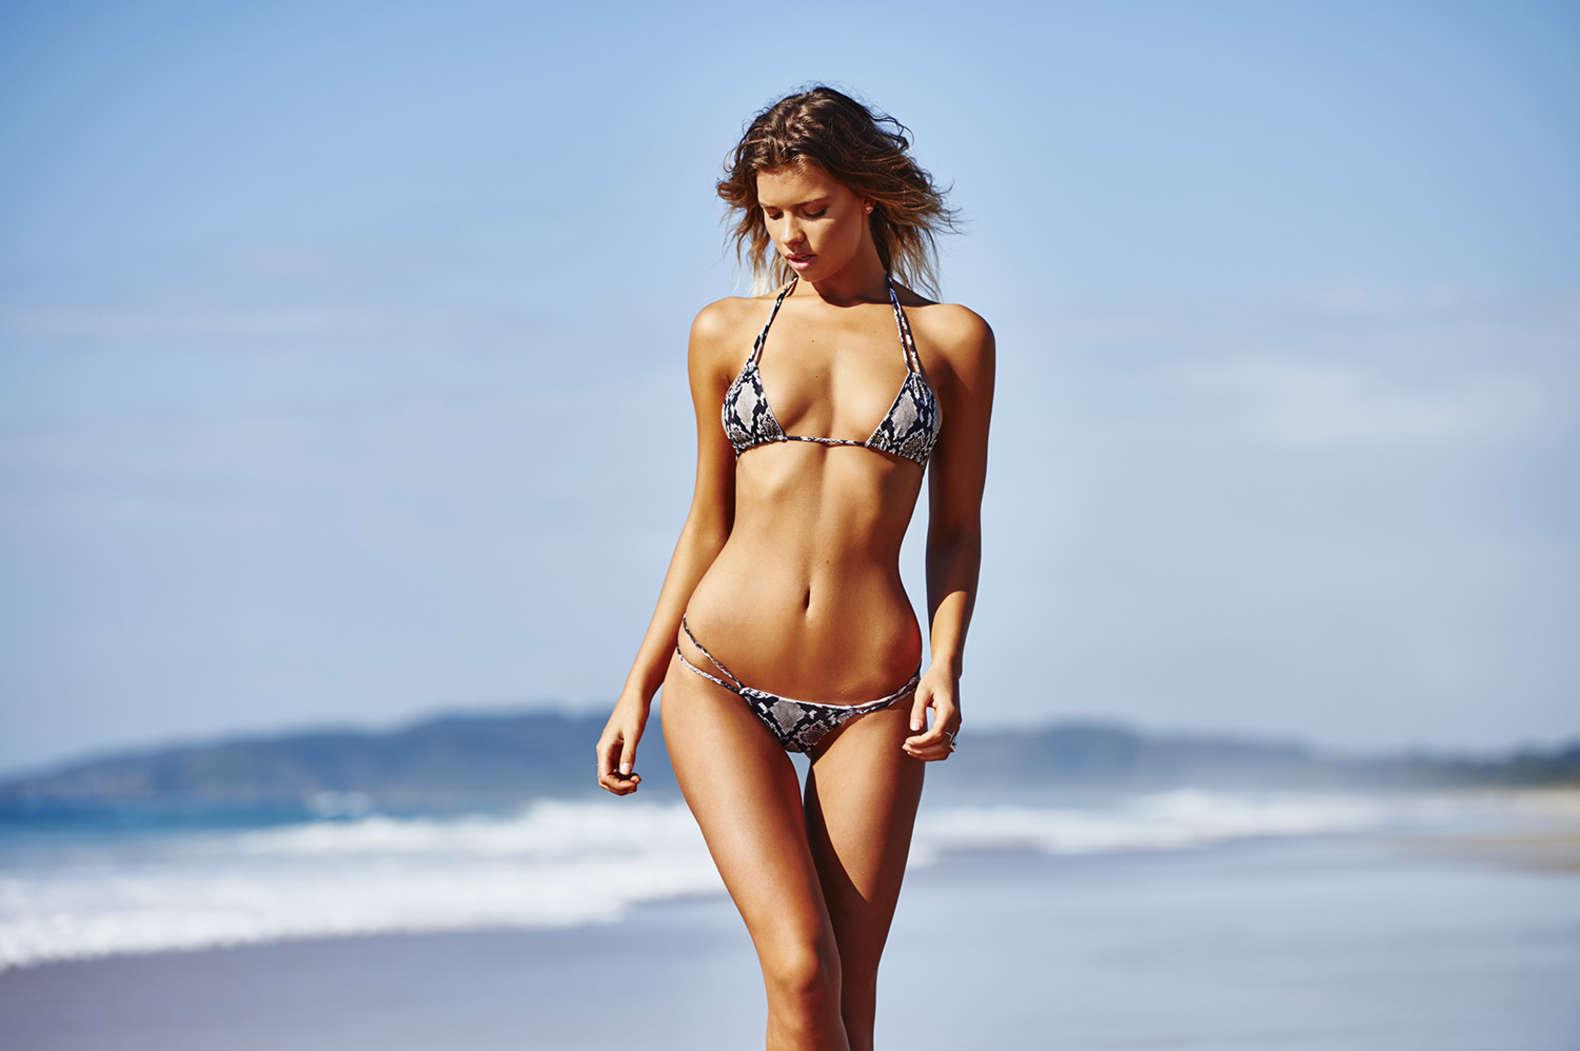 Abby Huntsman Bikini